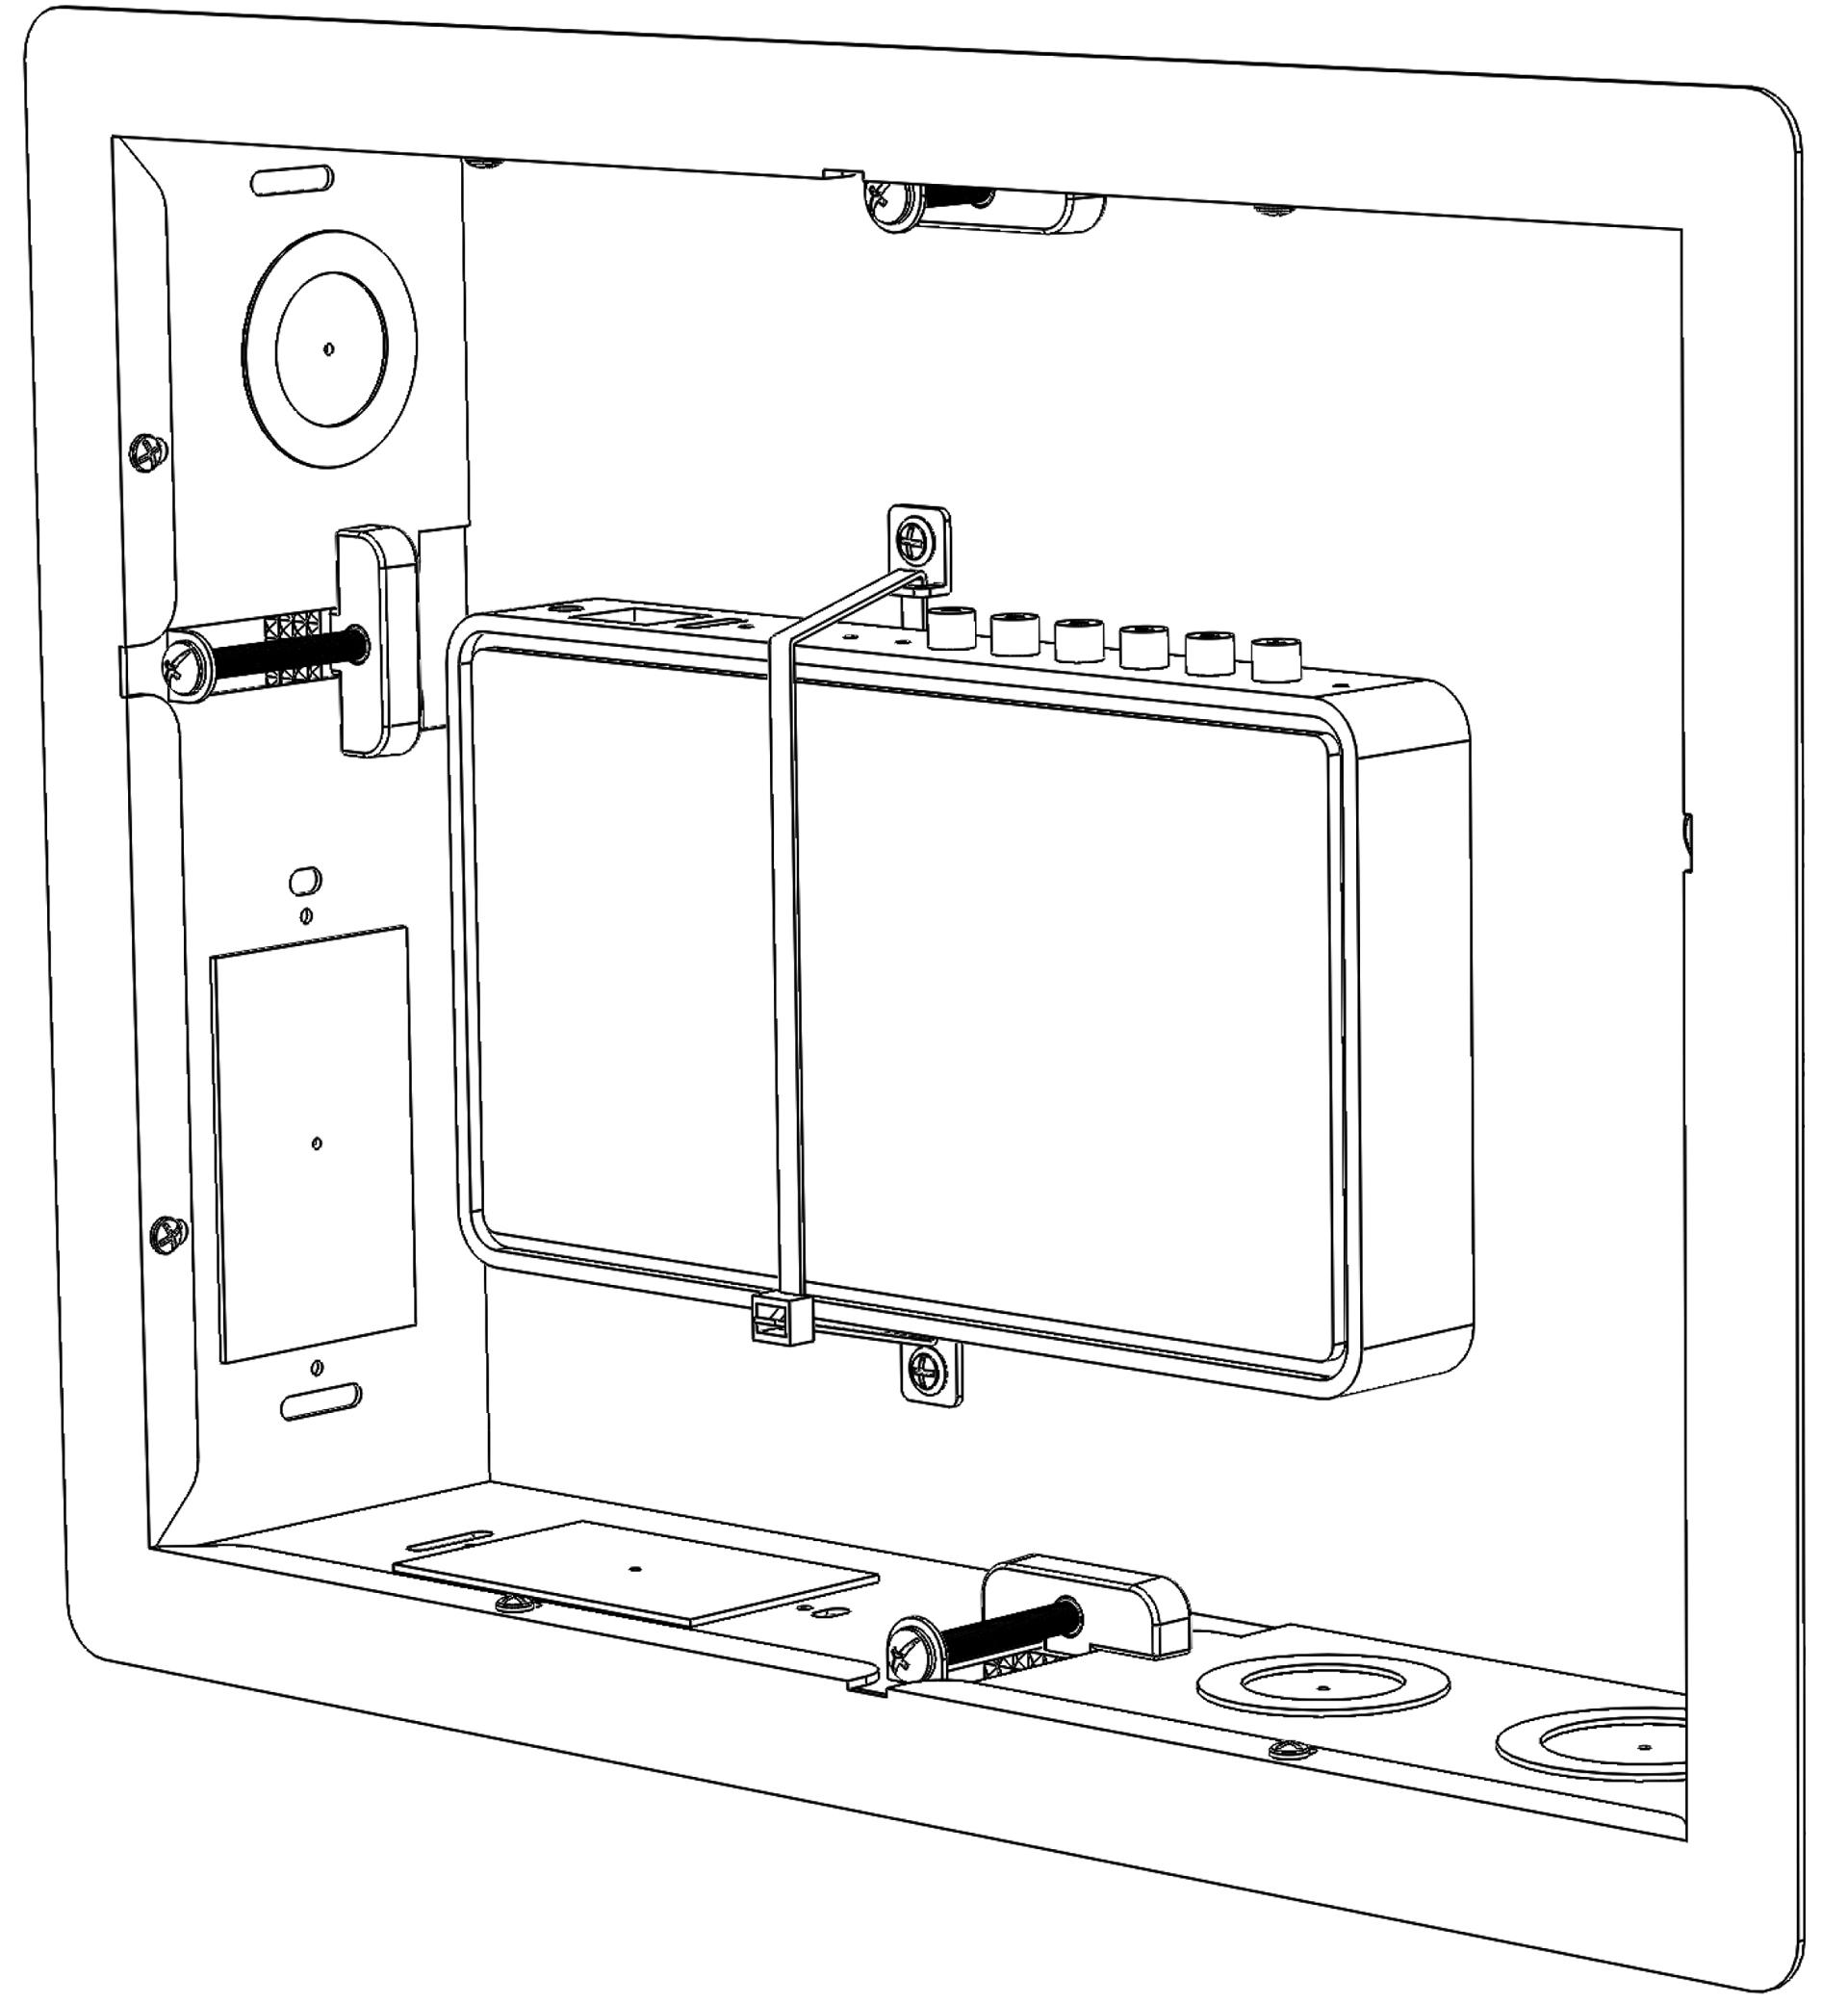 IWB-1x - For Manual Zipped